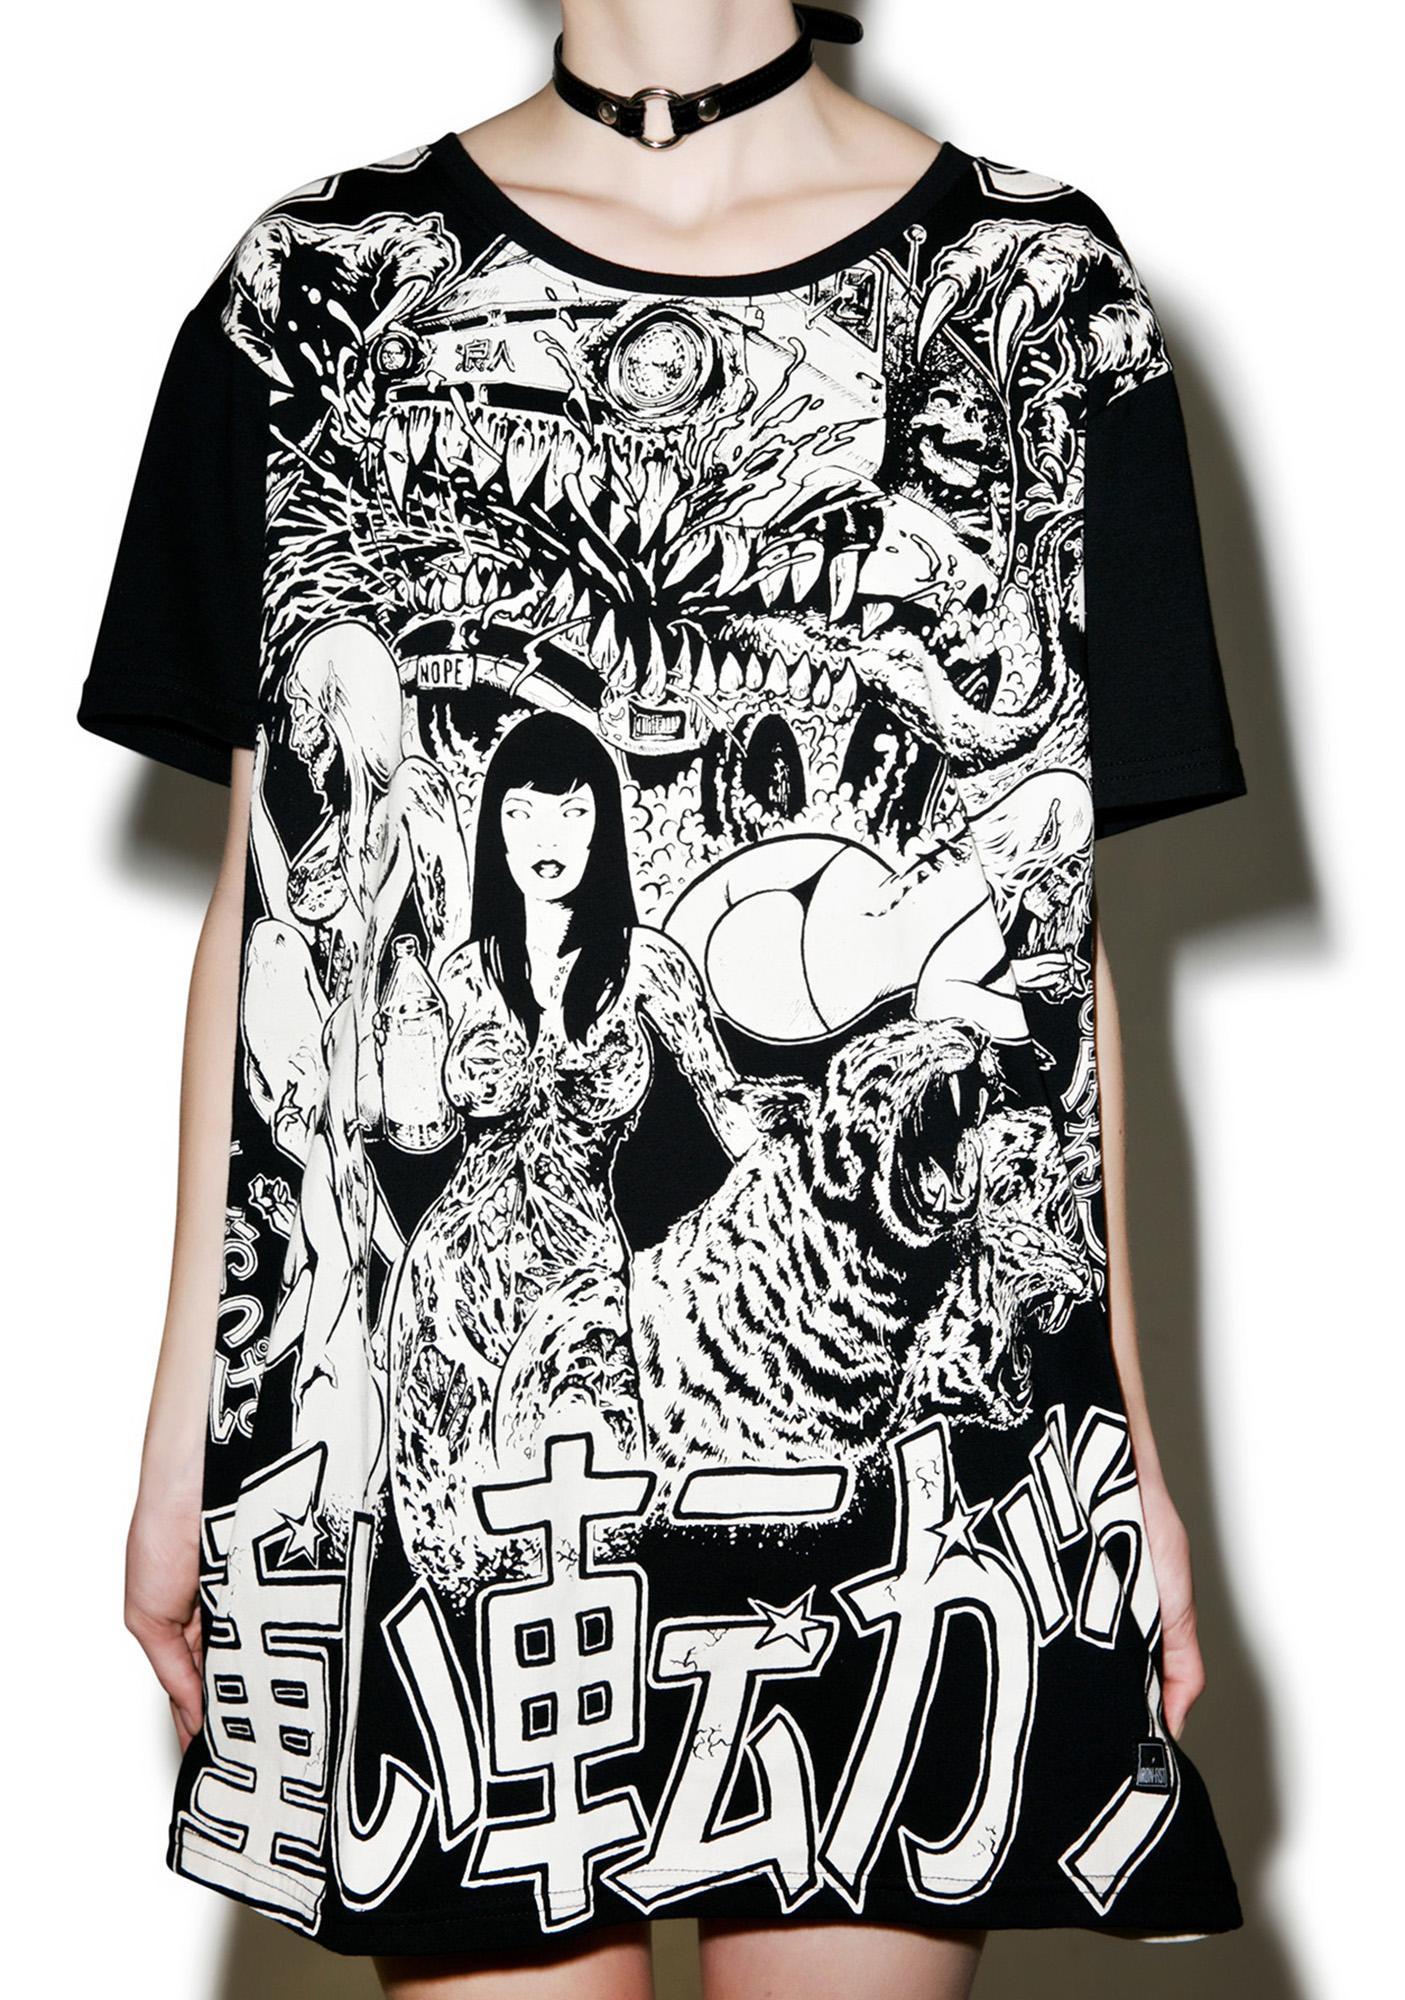 Iron Fist Shinjuku Baggy Skate Tee